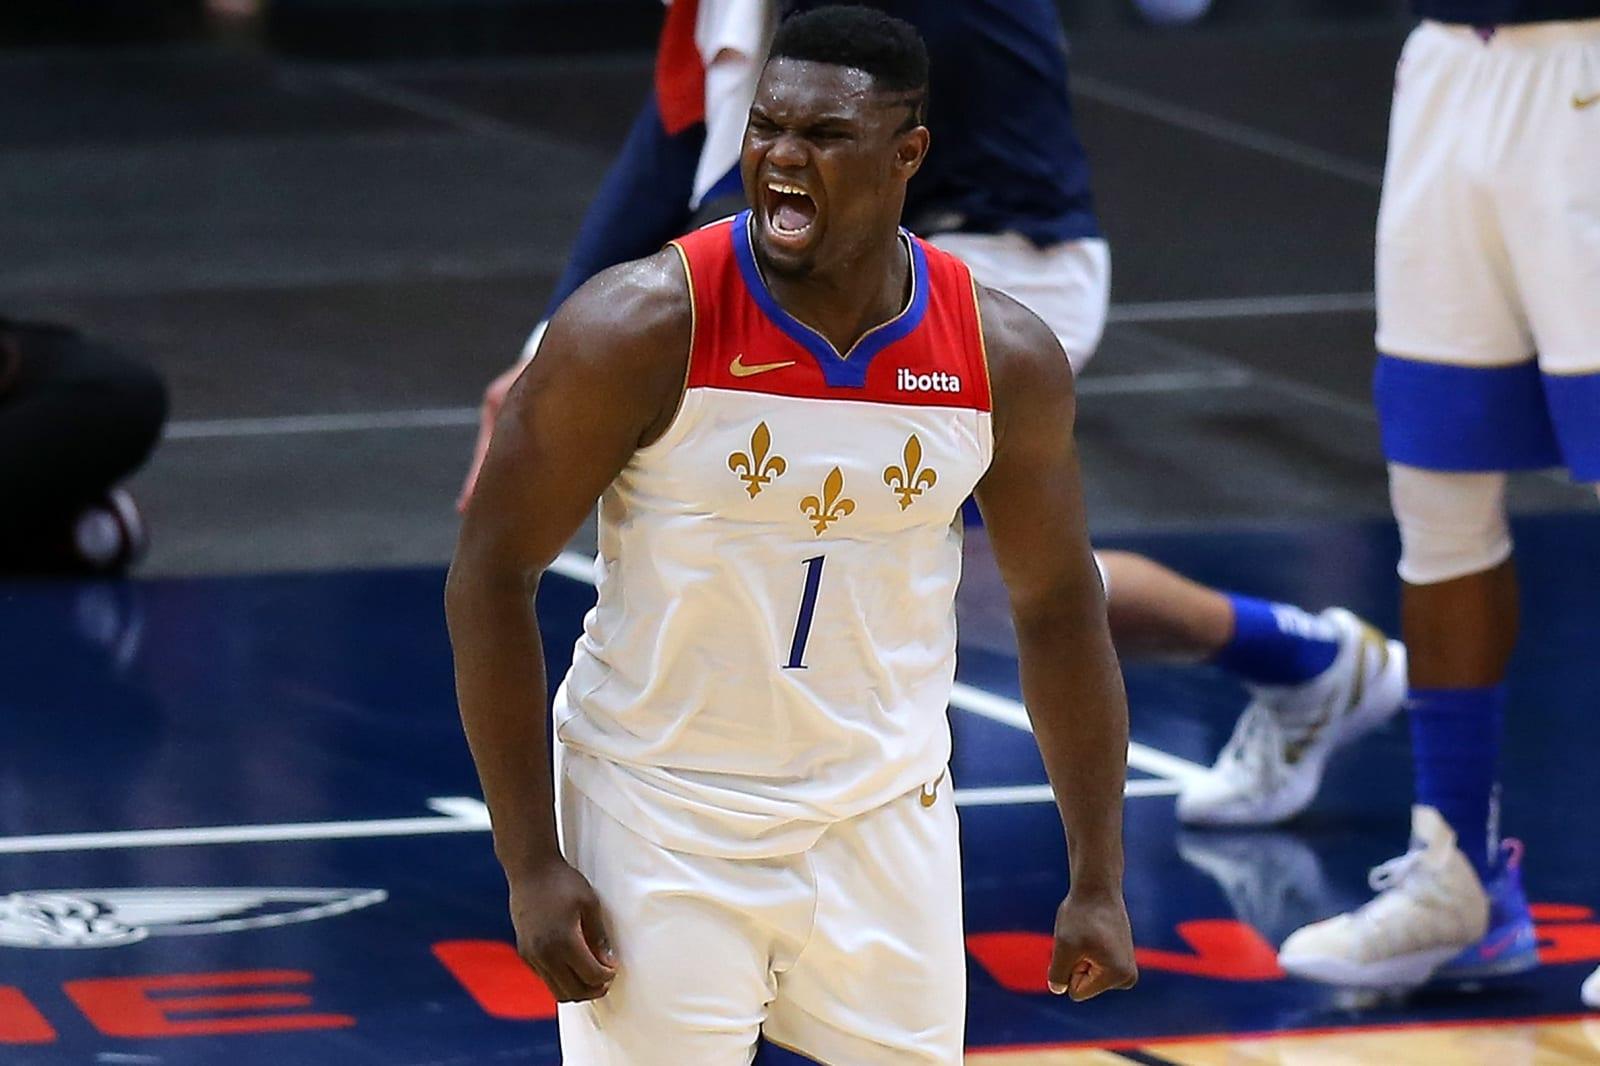 New Orleans Pelicans: Zion Williamson